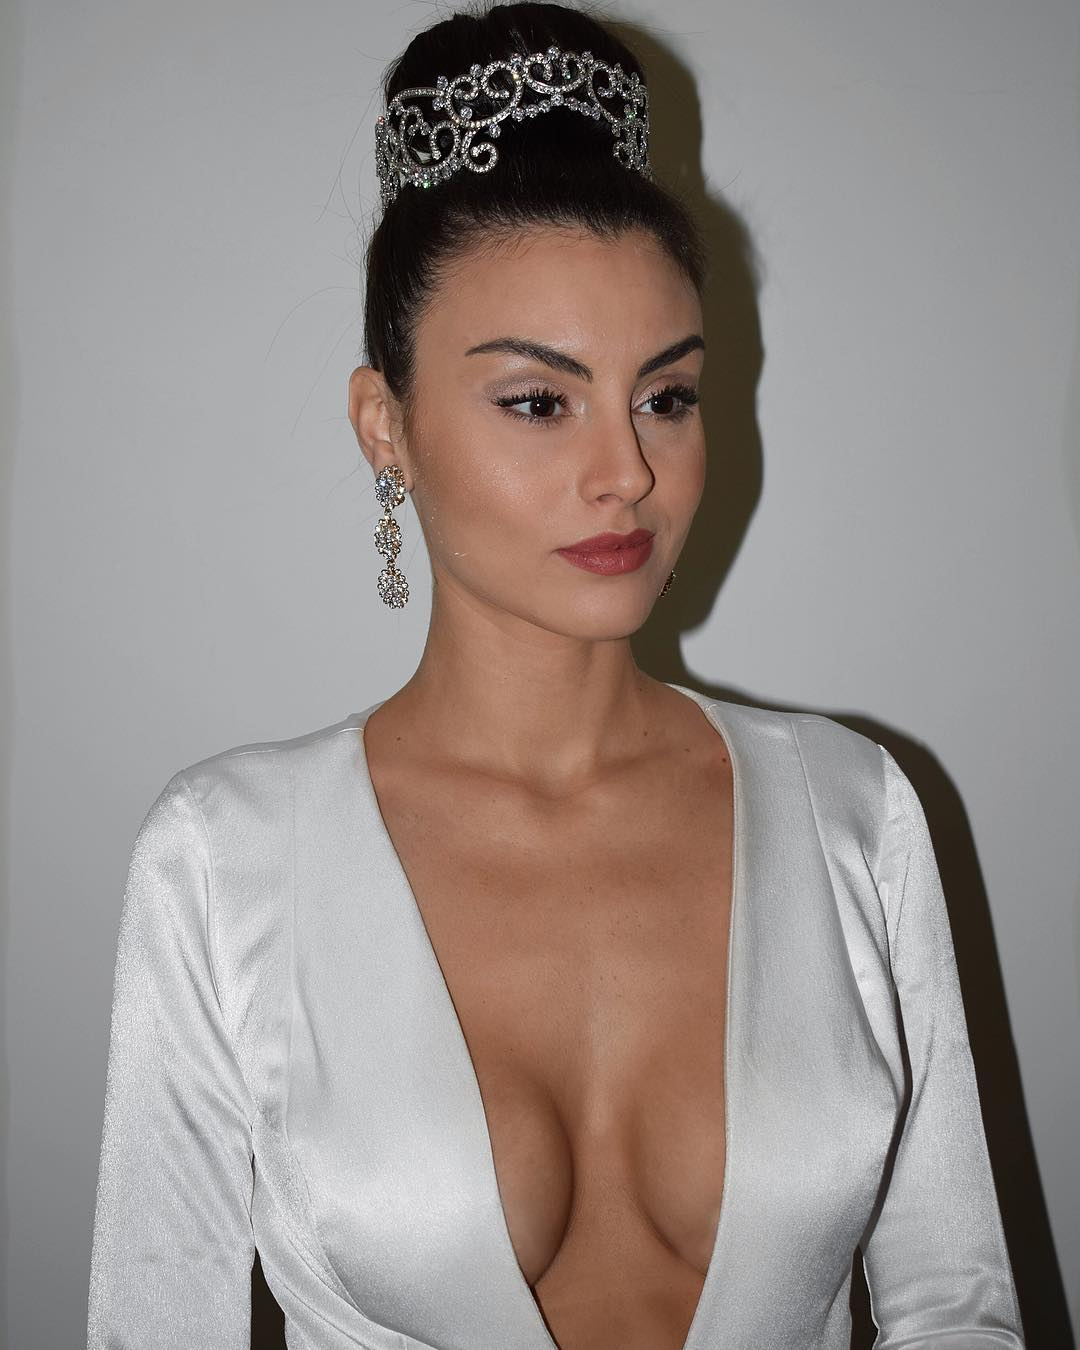 marjorie marcelle, top 5 de miss grand international 2019. - Página 2 40392411